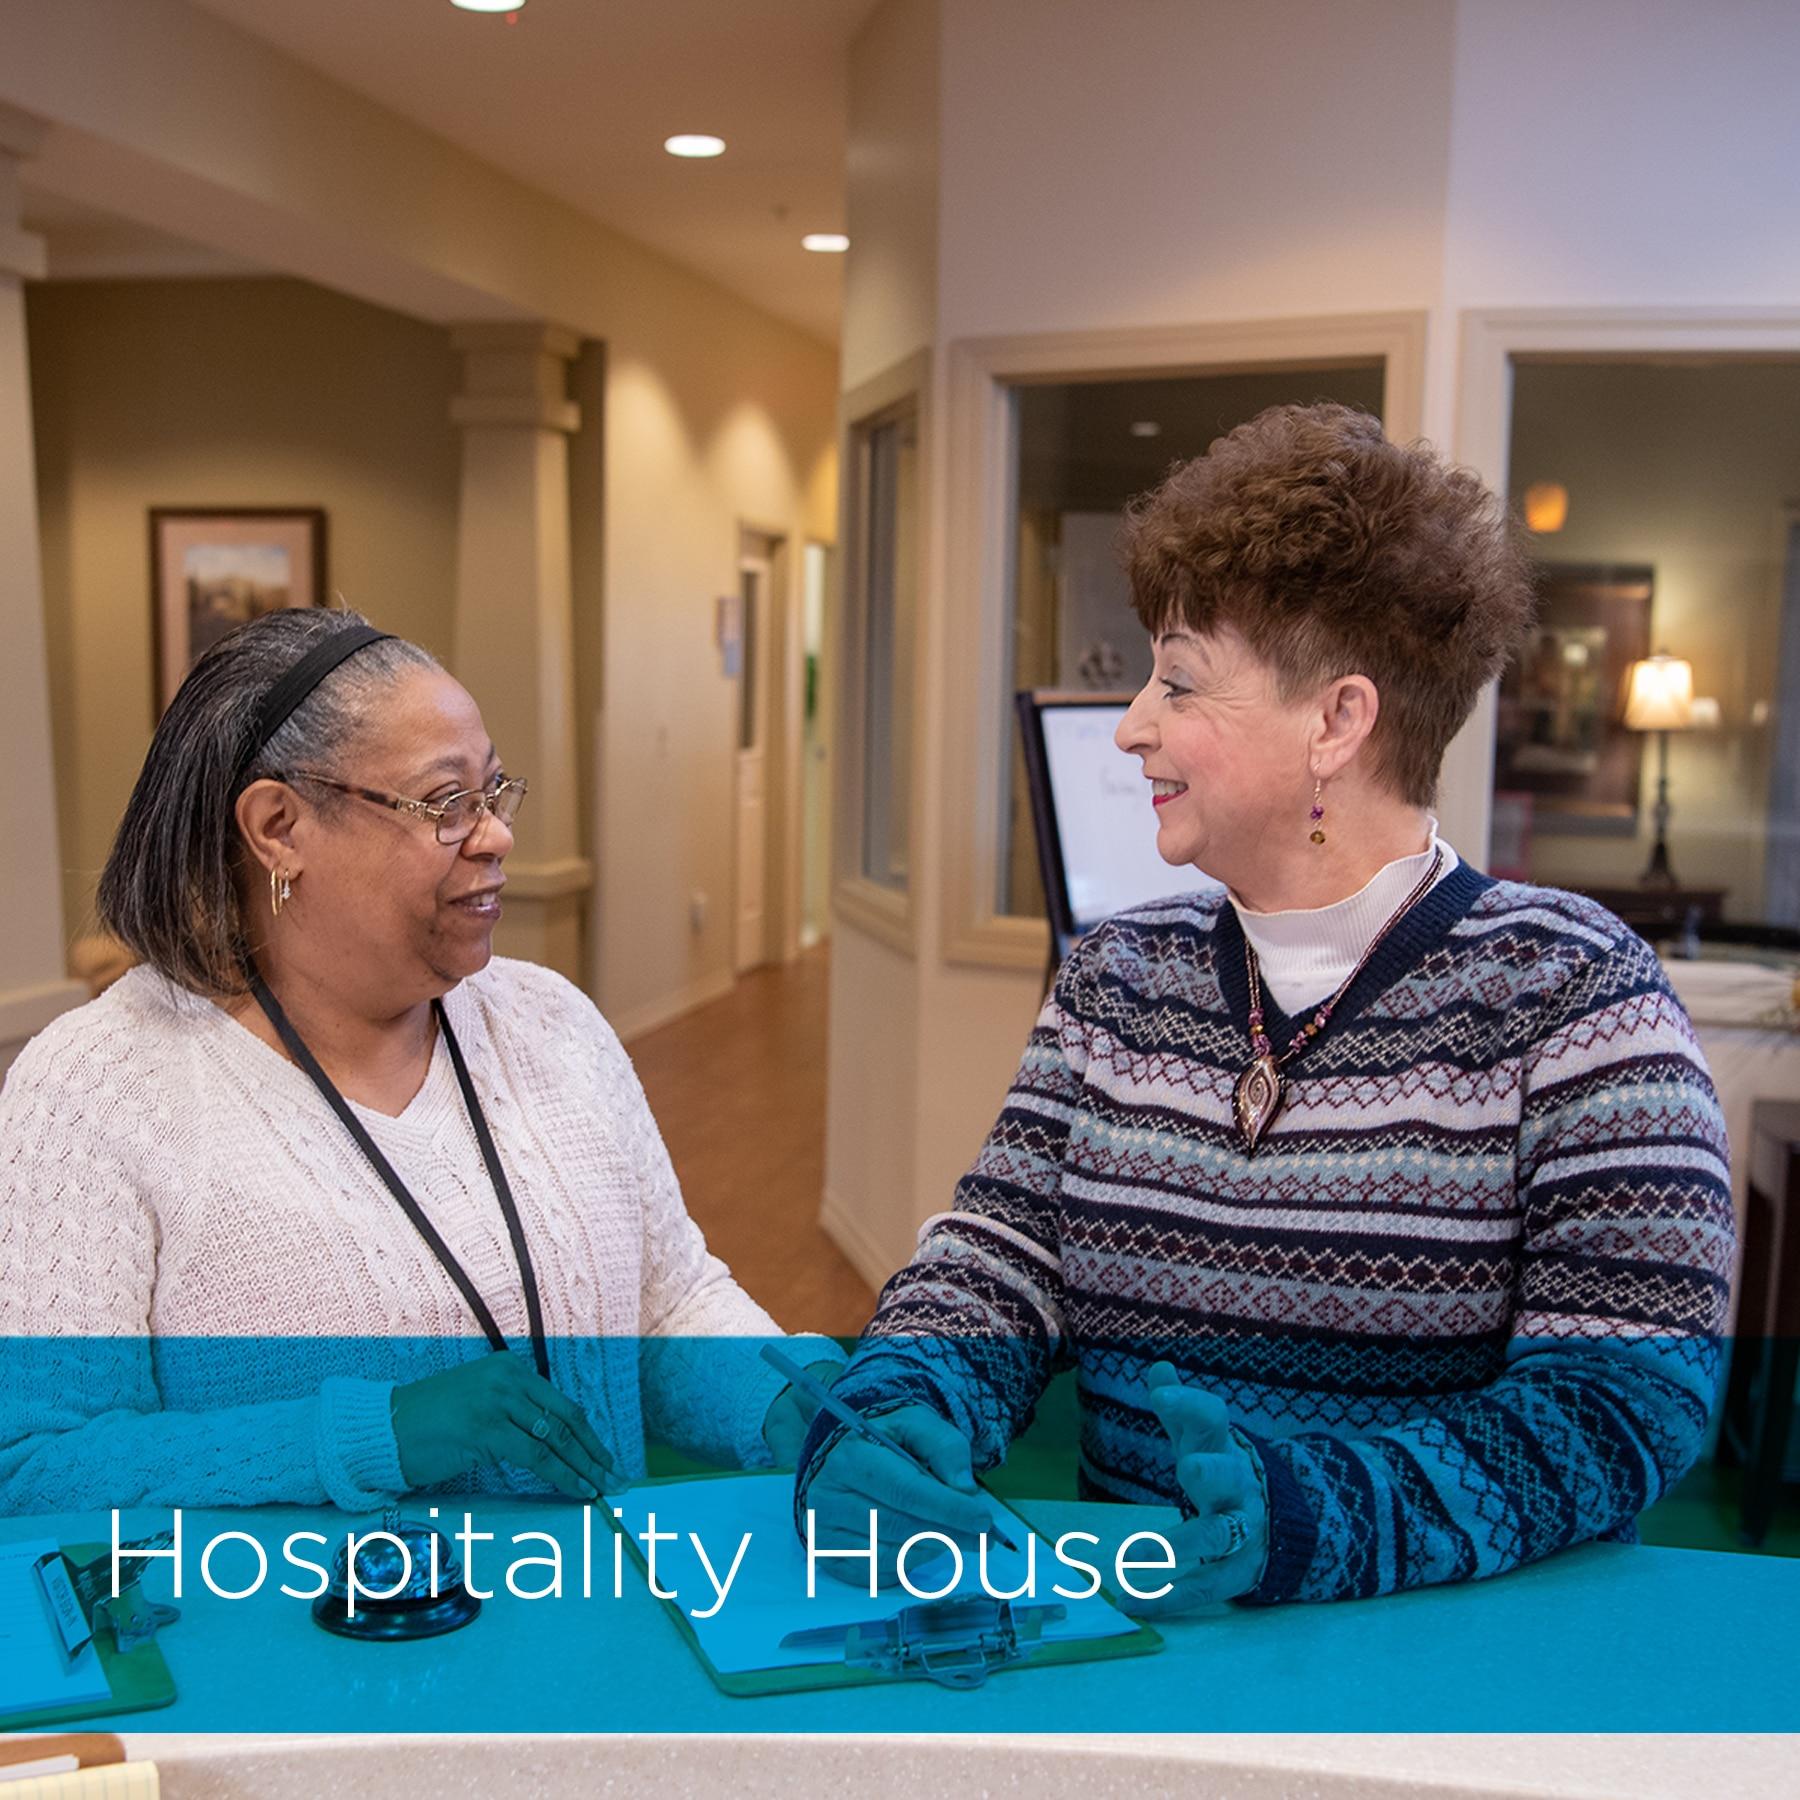 Hospitality House featured image